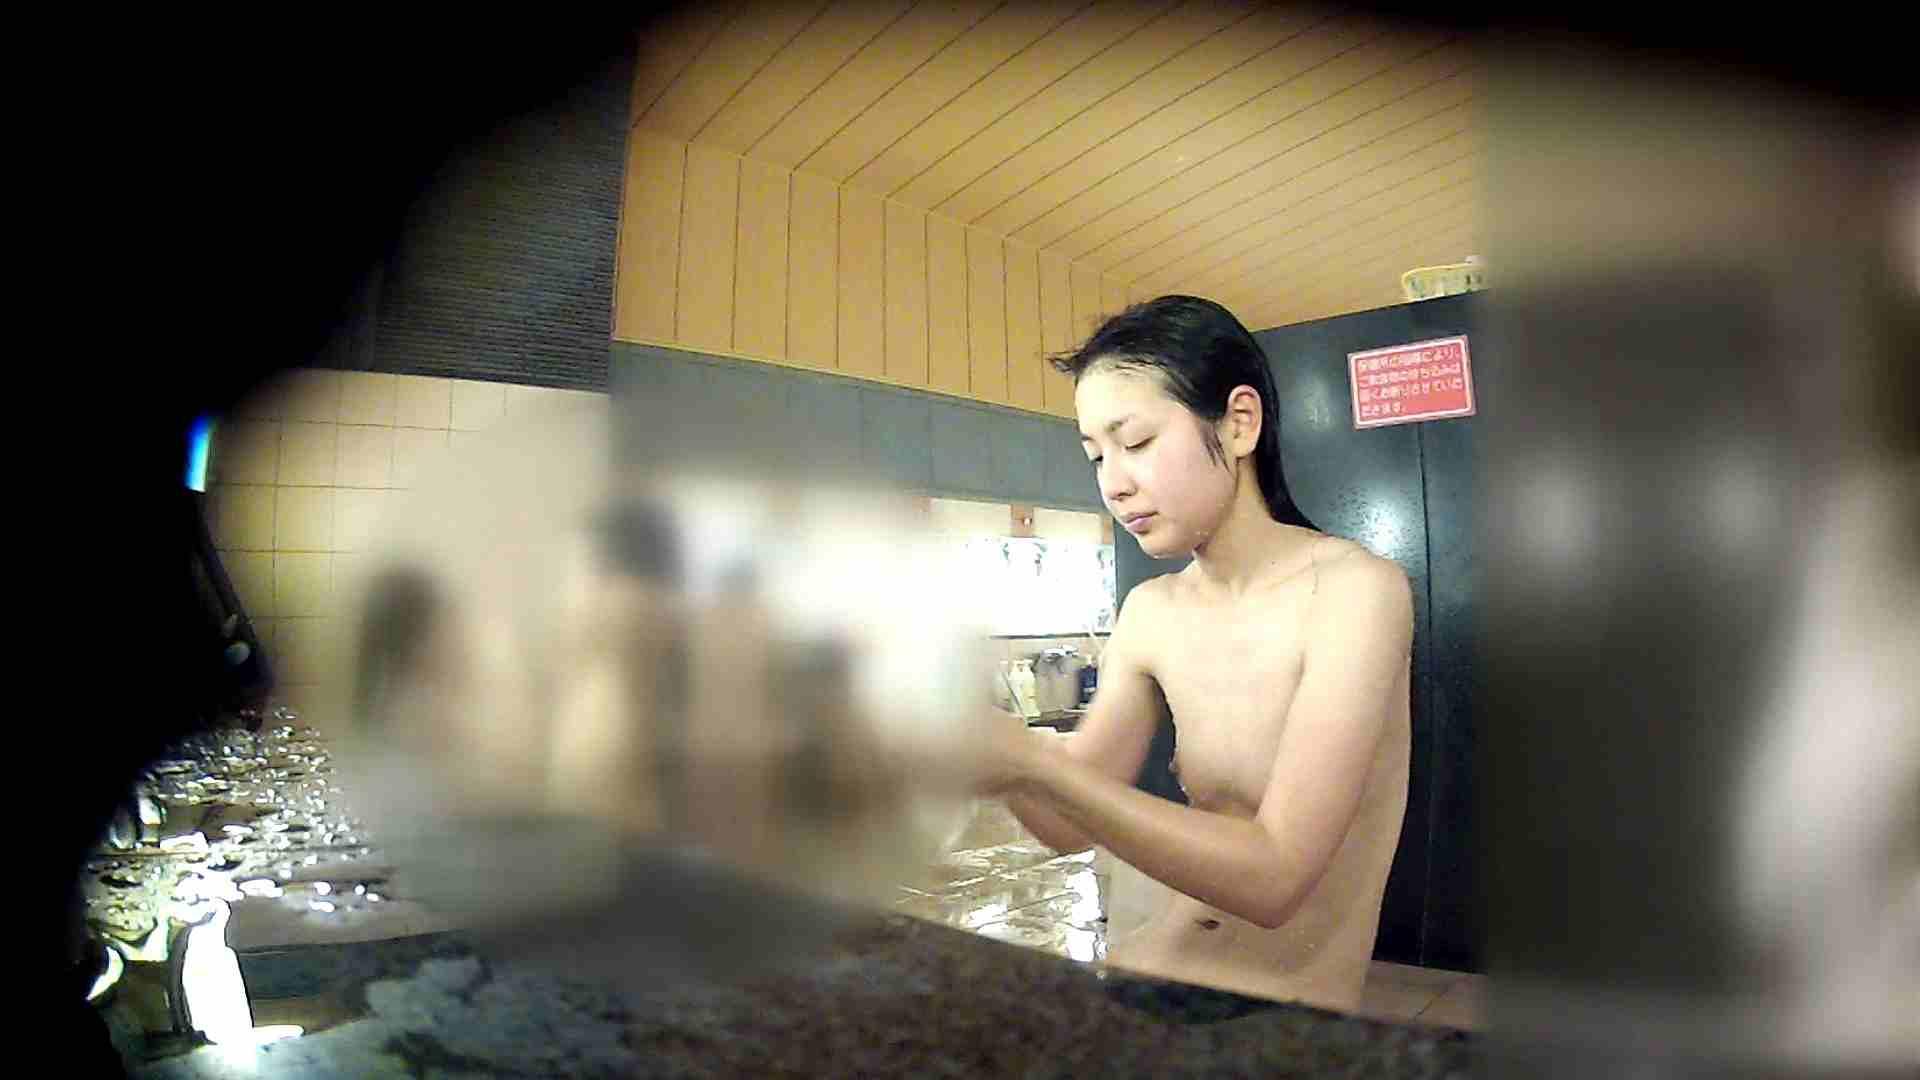 潜入女盗撮師のスーパー銭湯 Vol.01 銭湯 | 盗撮  45画像 19